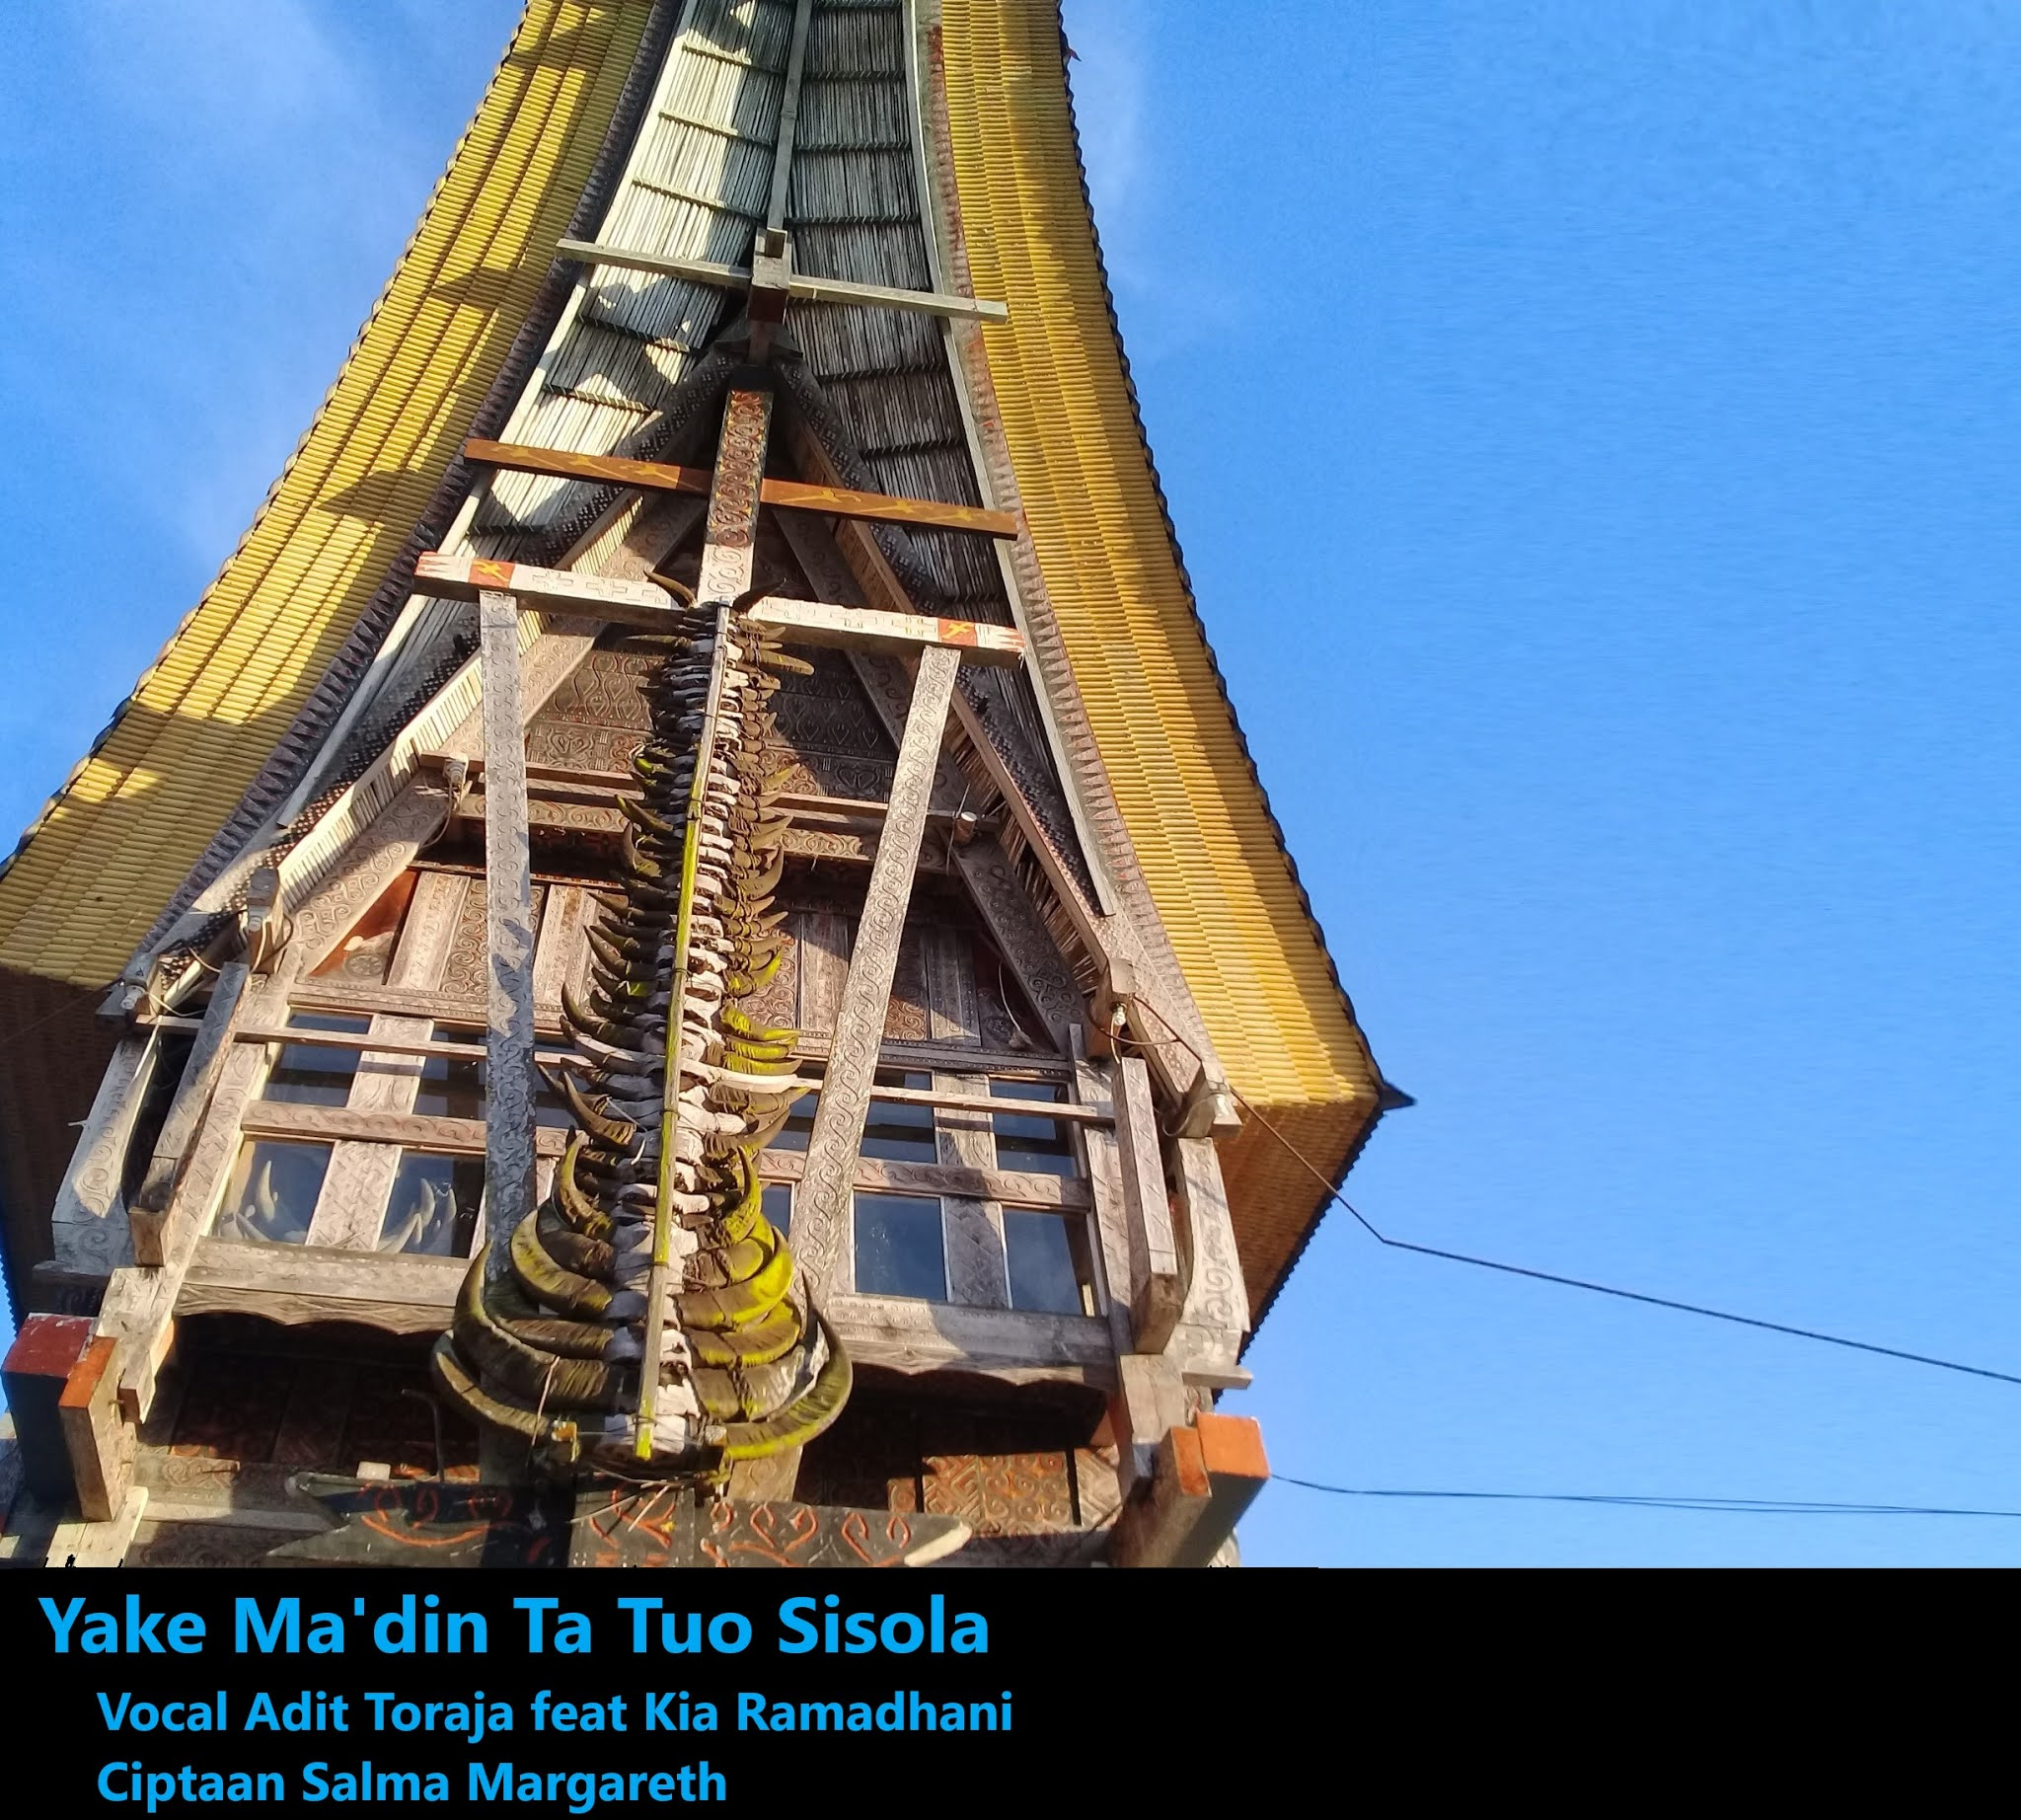 Lirik Lagu Yake Ma'din Ta Tuo Sisola - Salma Margareth